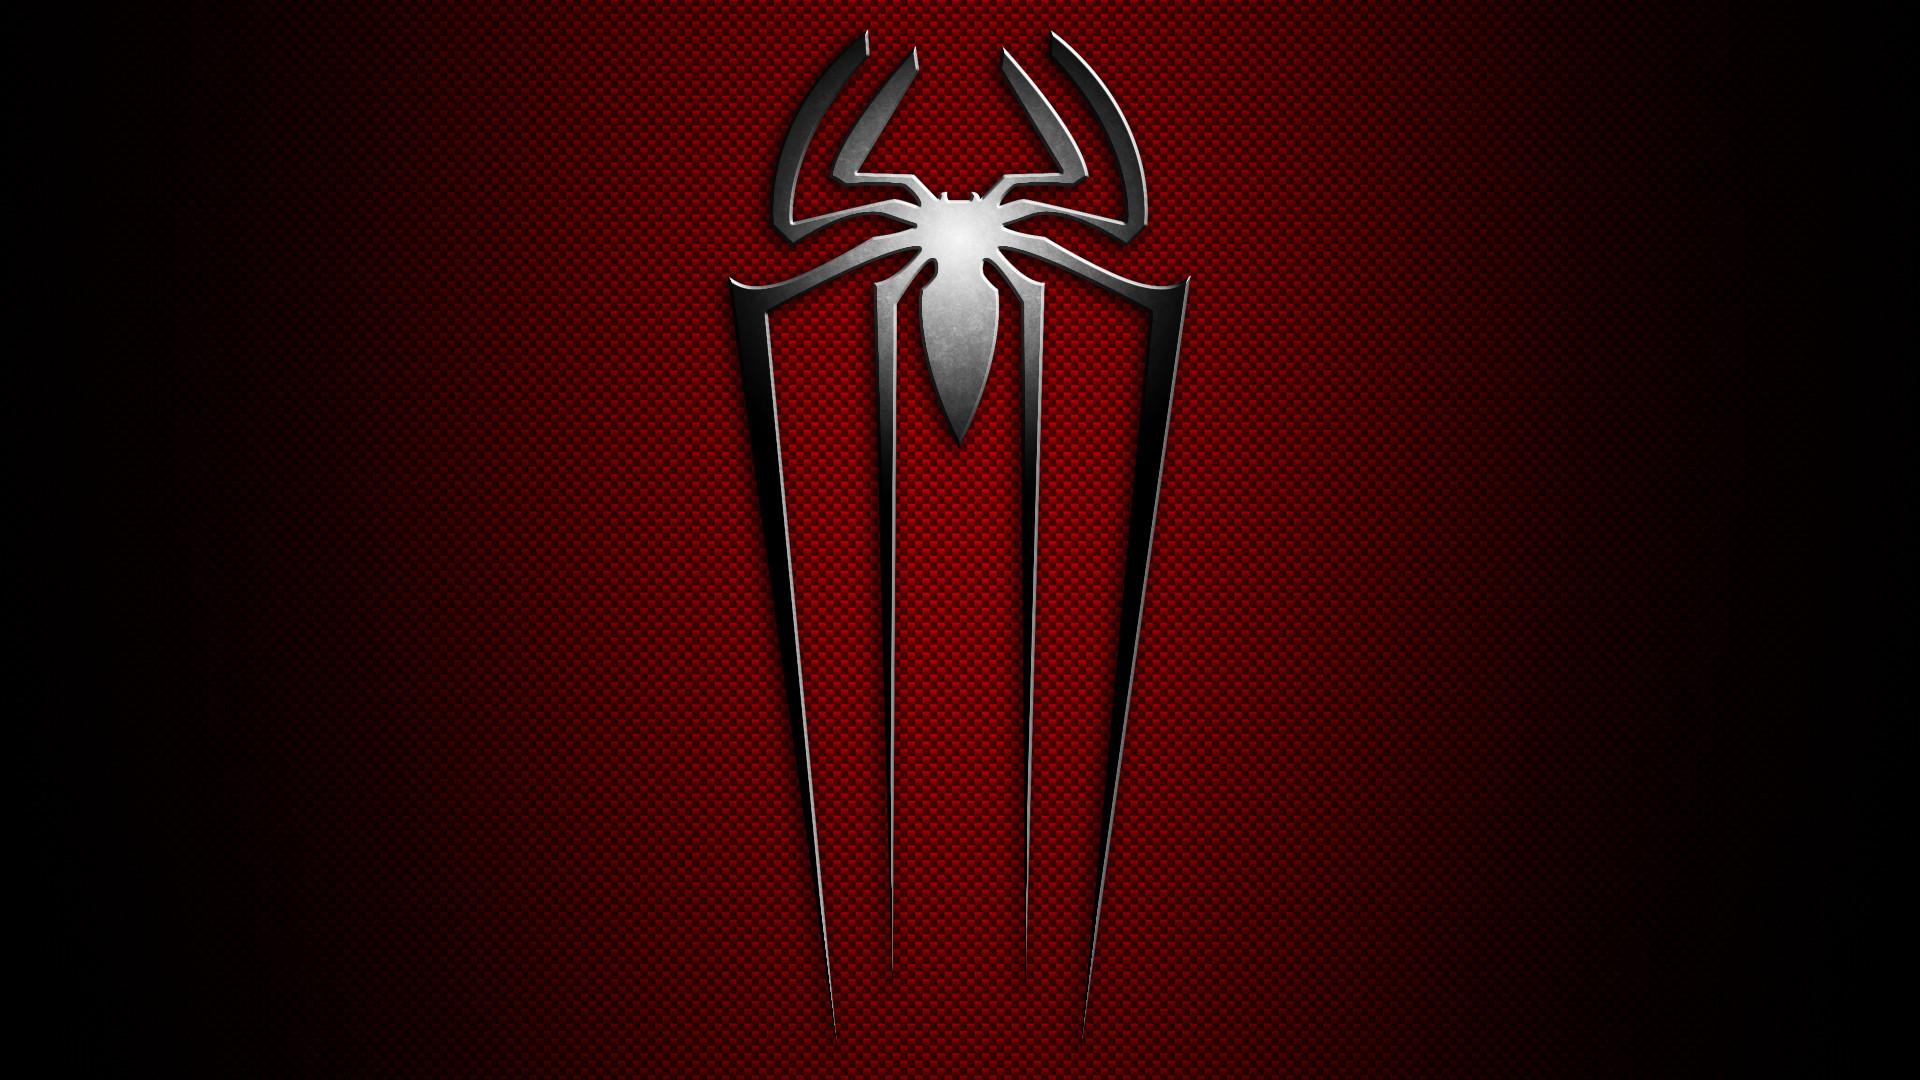 Good Wallpaper Logo Spiderman - 451236-download-free-spiderman-logo-wallpaper-1920x1080  HD_639474.jpg